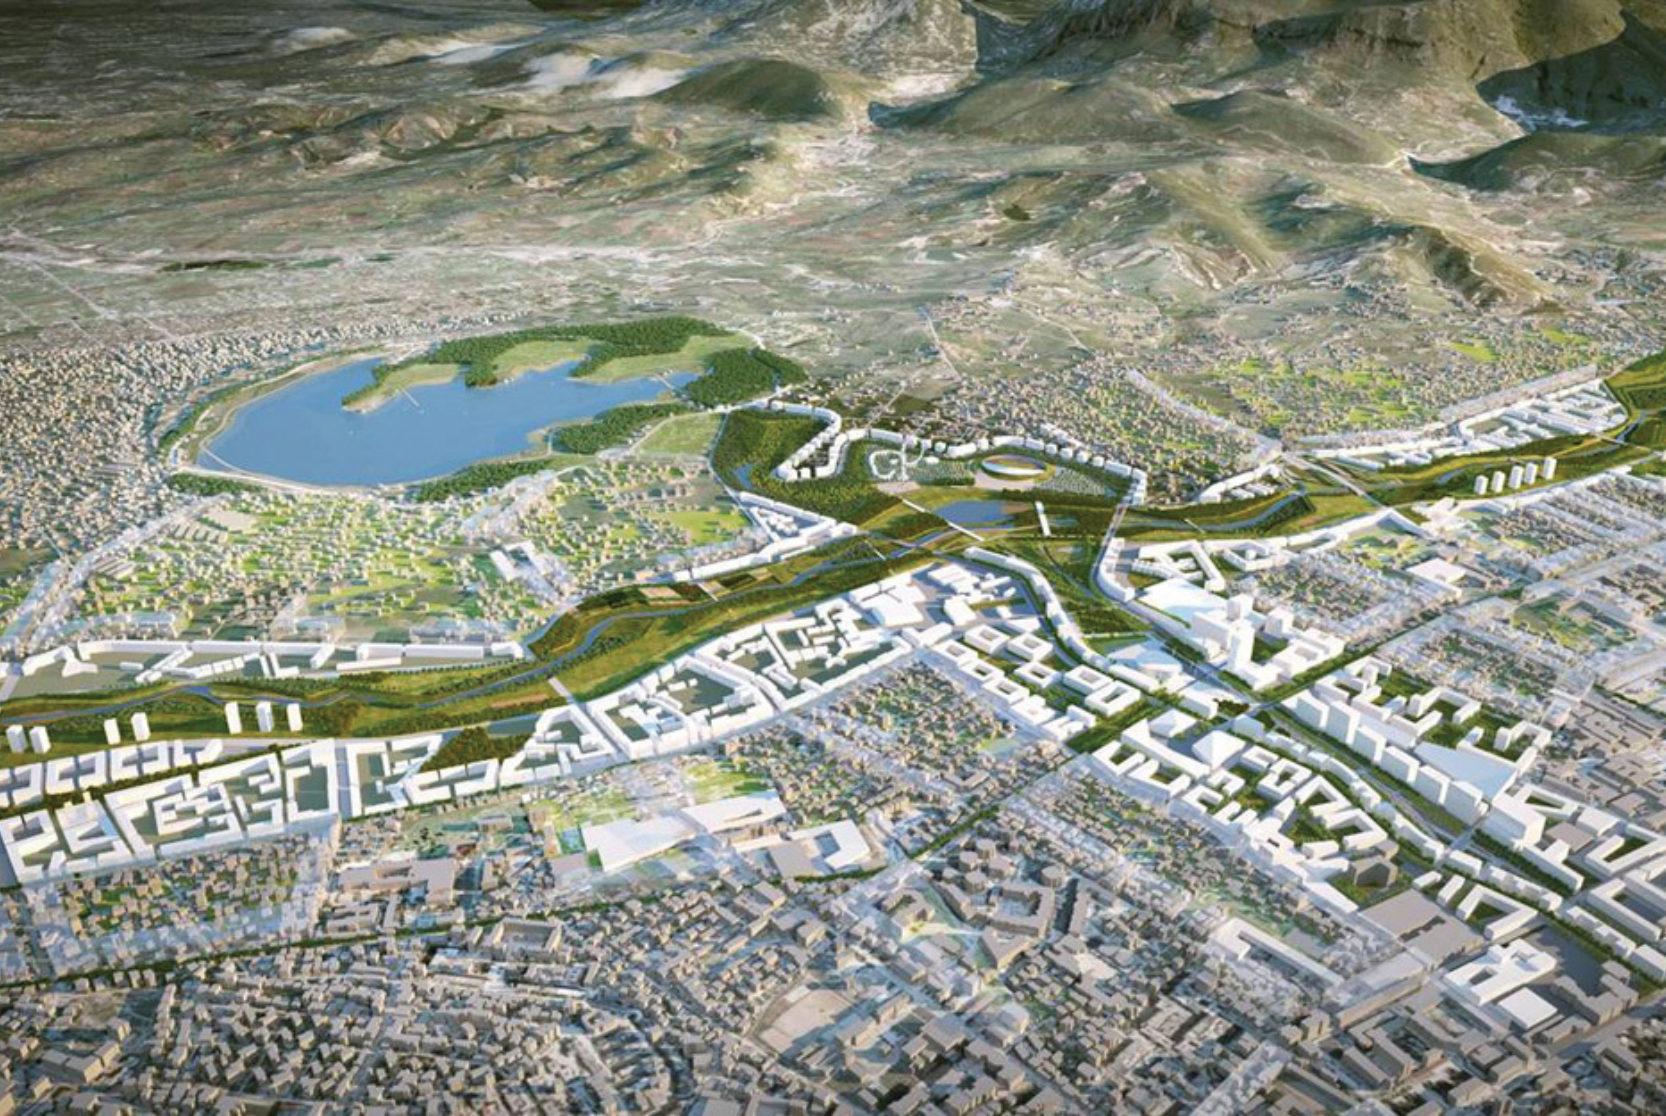 Tirana Northern Boulevard & River Project Masterplan